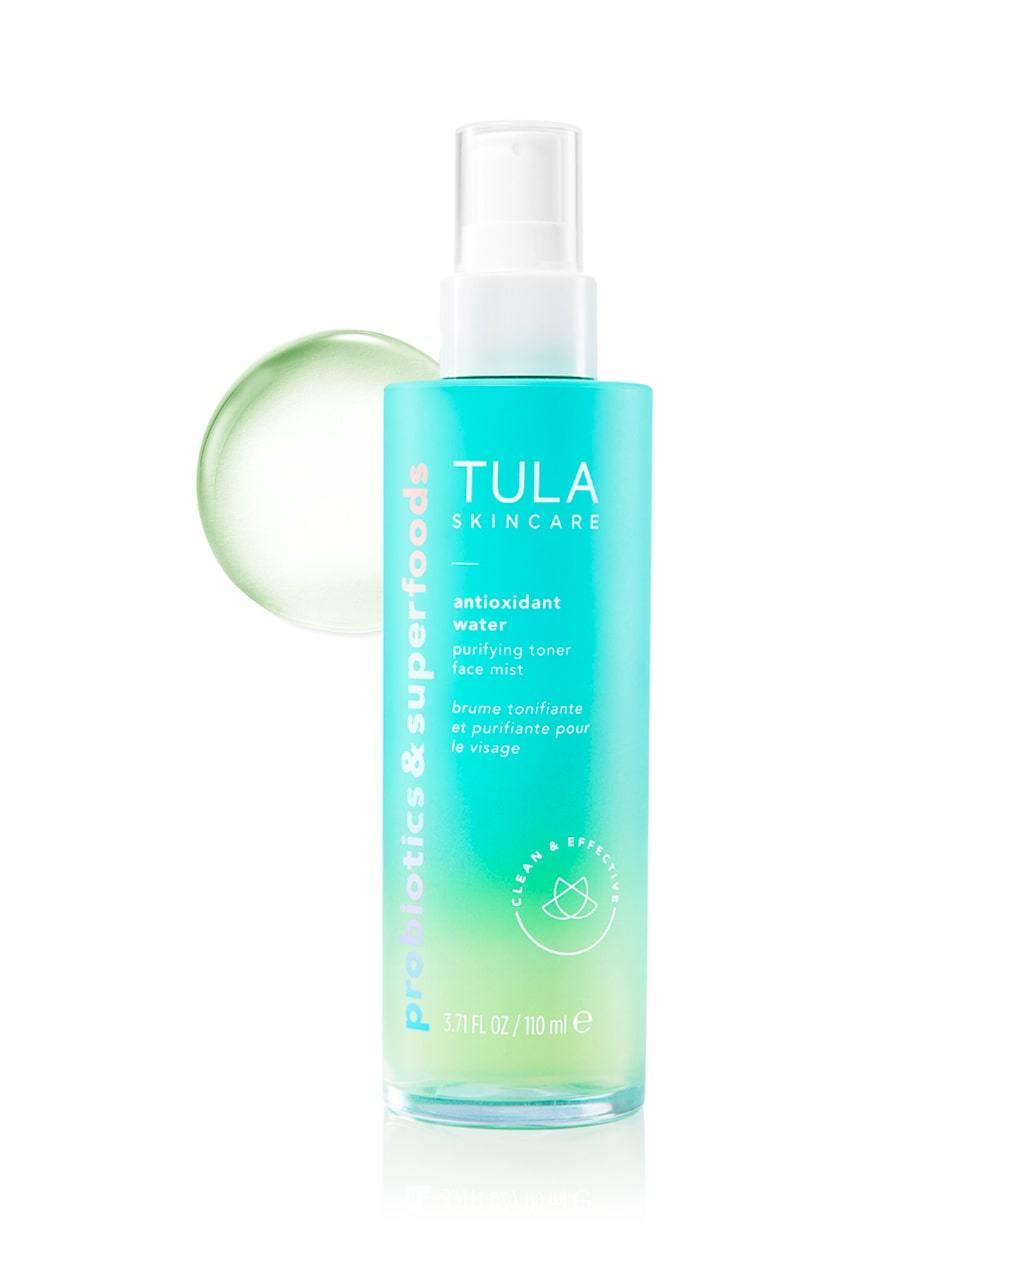 antioxidant water | Tula Skincare